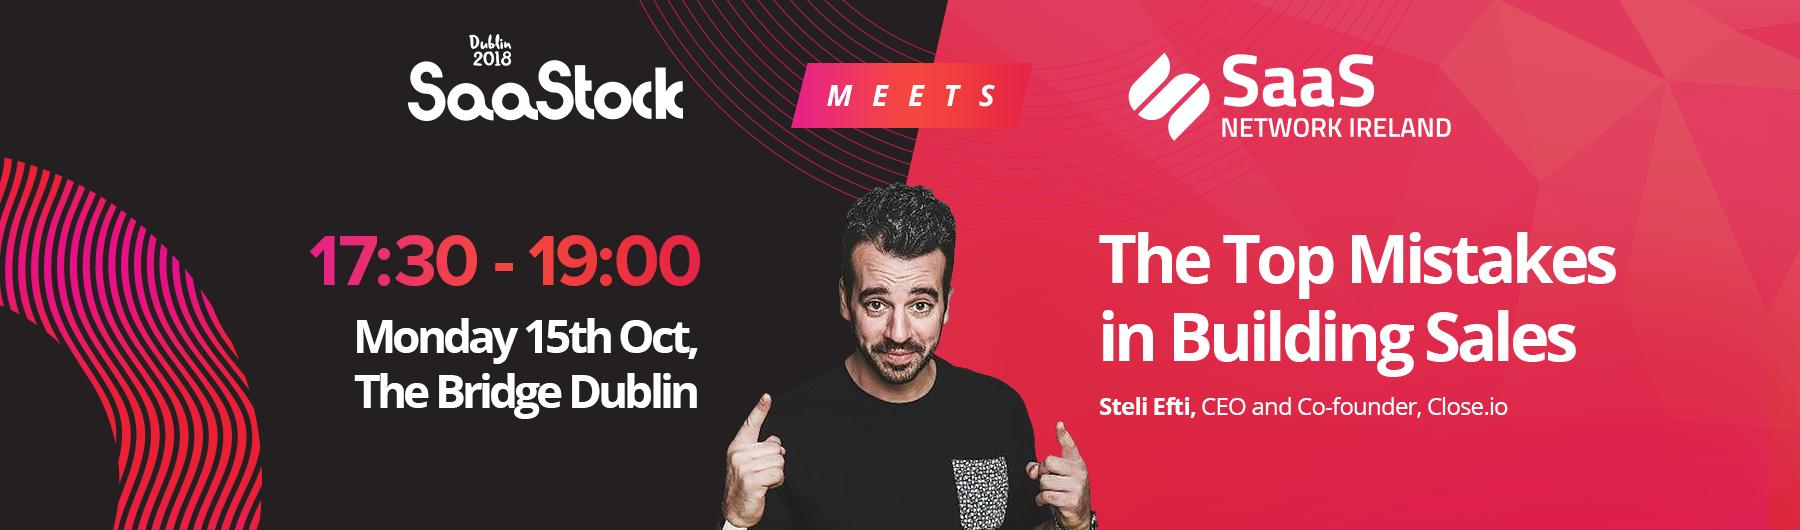 SaaStock meets SaaS Network Ireland